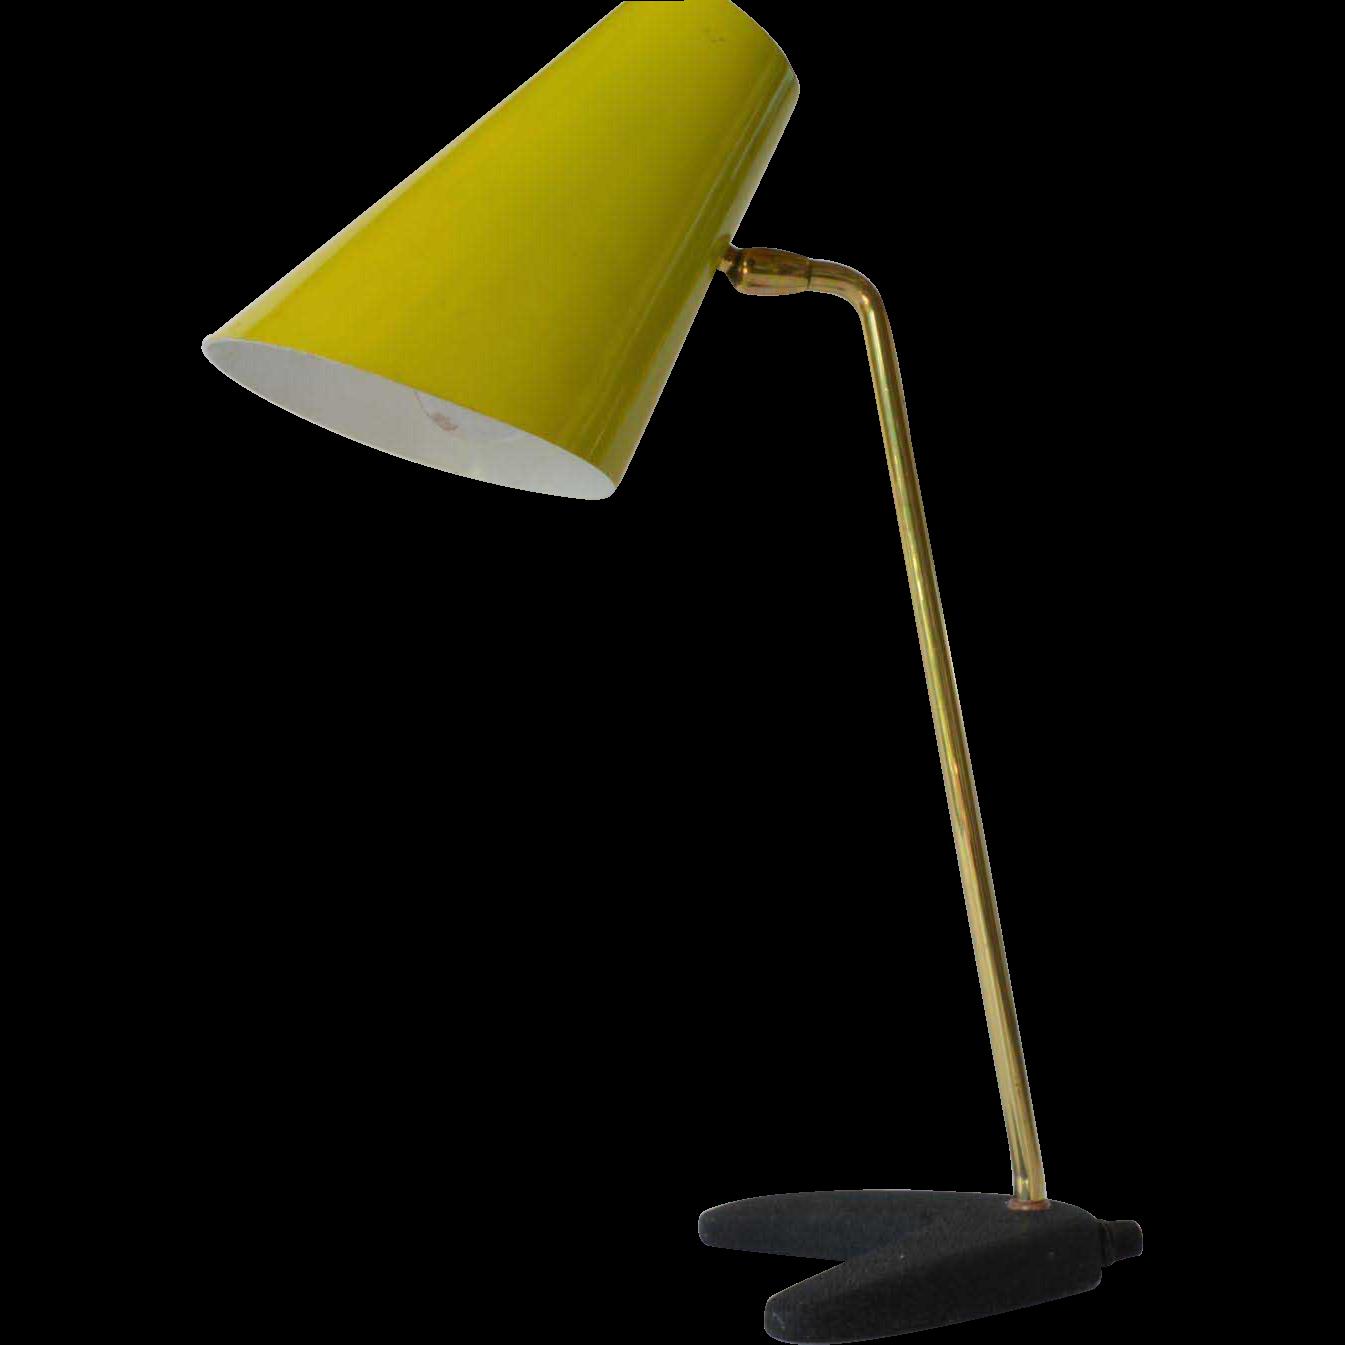 retro 1980c metal desk lamp from caraghantiques on ruby lane. Black Bedroom Furniture Sets. Home Design Ideas